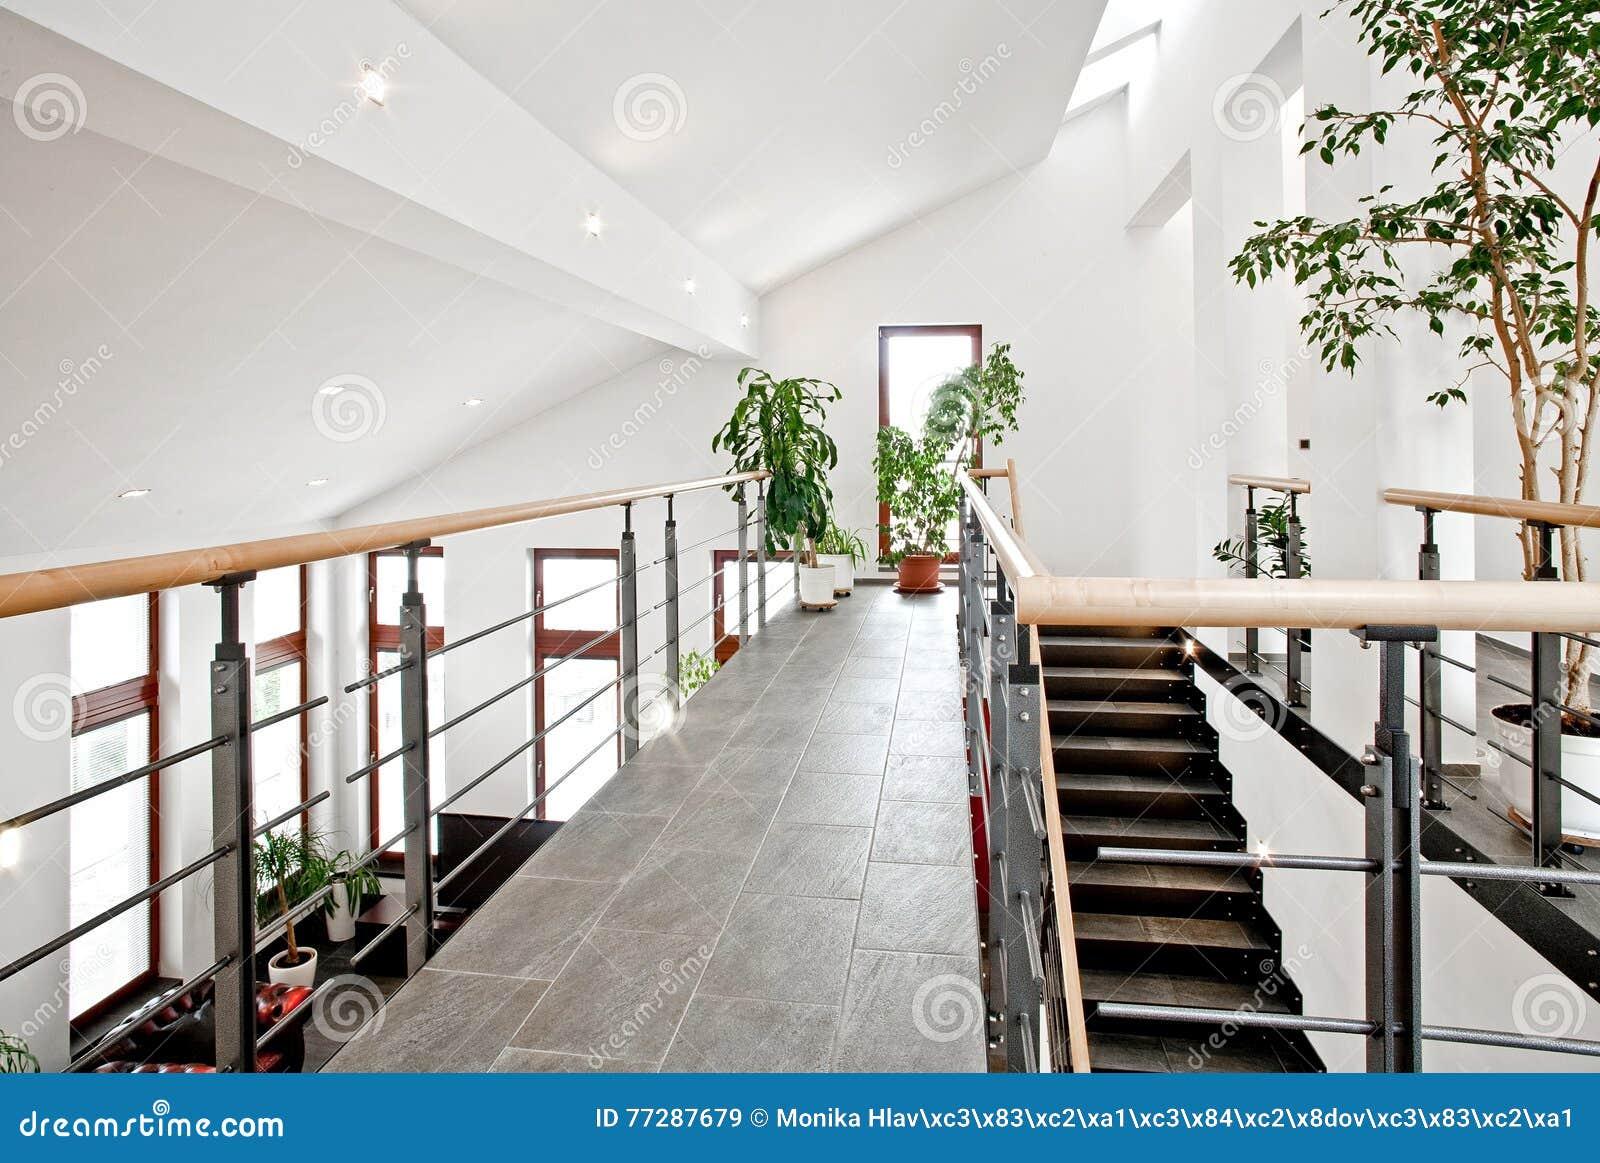 Entree avec escalier fashion designs - Decoration hall d entree avec escalier ...